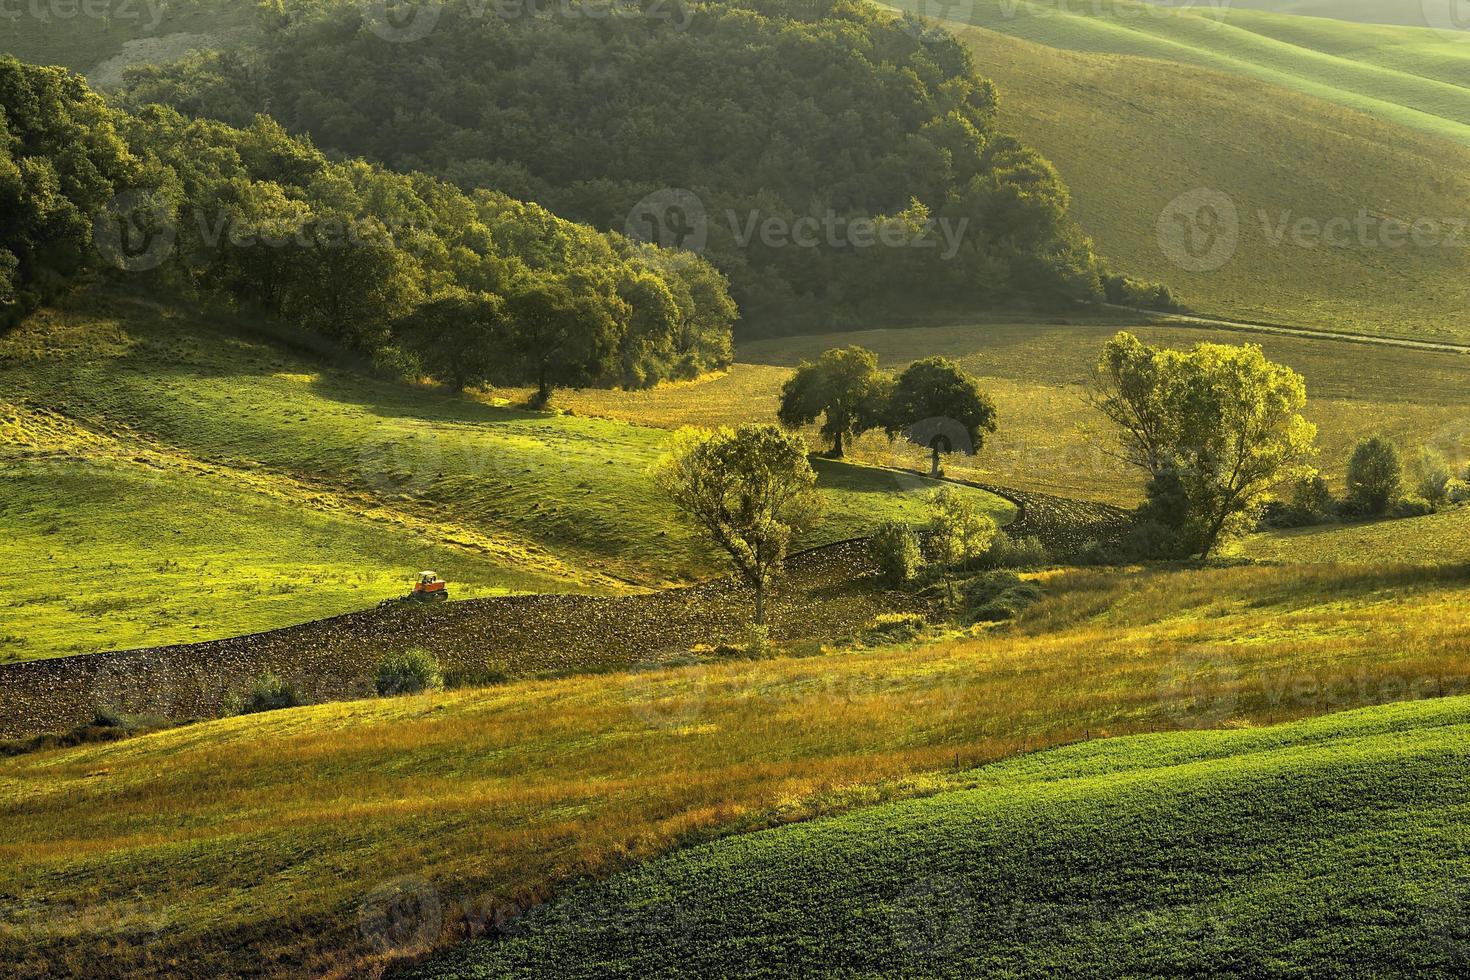 Toscane - panorama du paysage, collines et prairie, toscana - italie photo